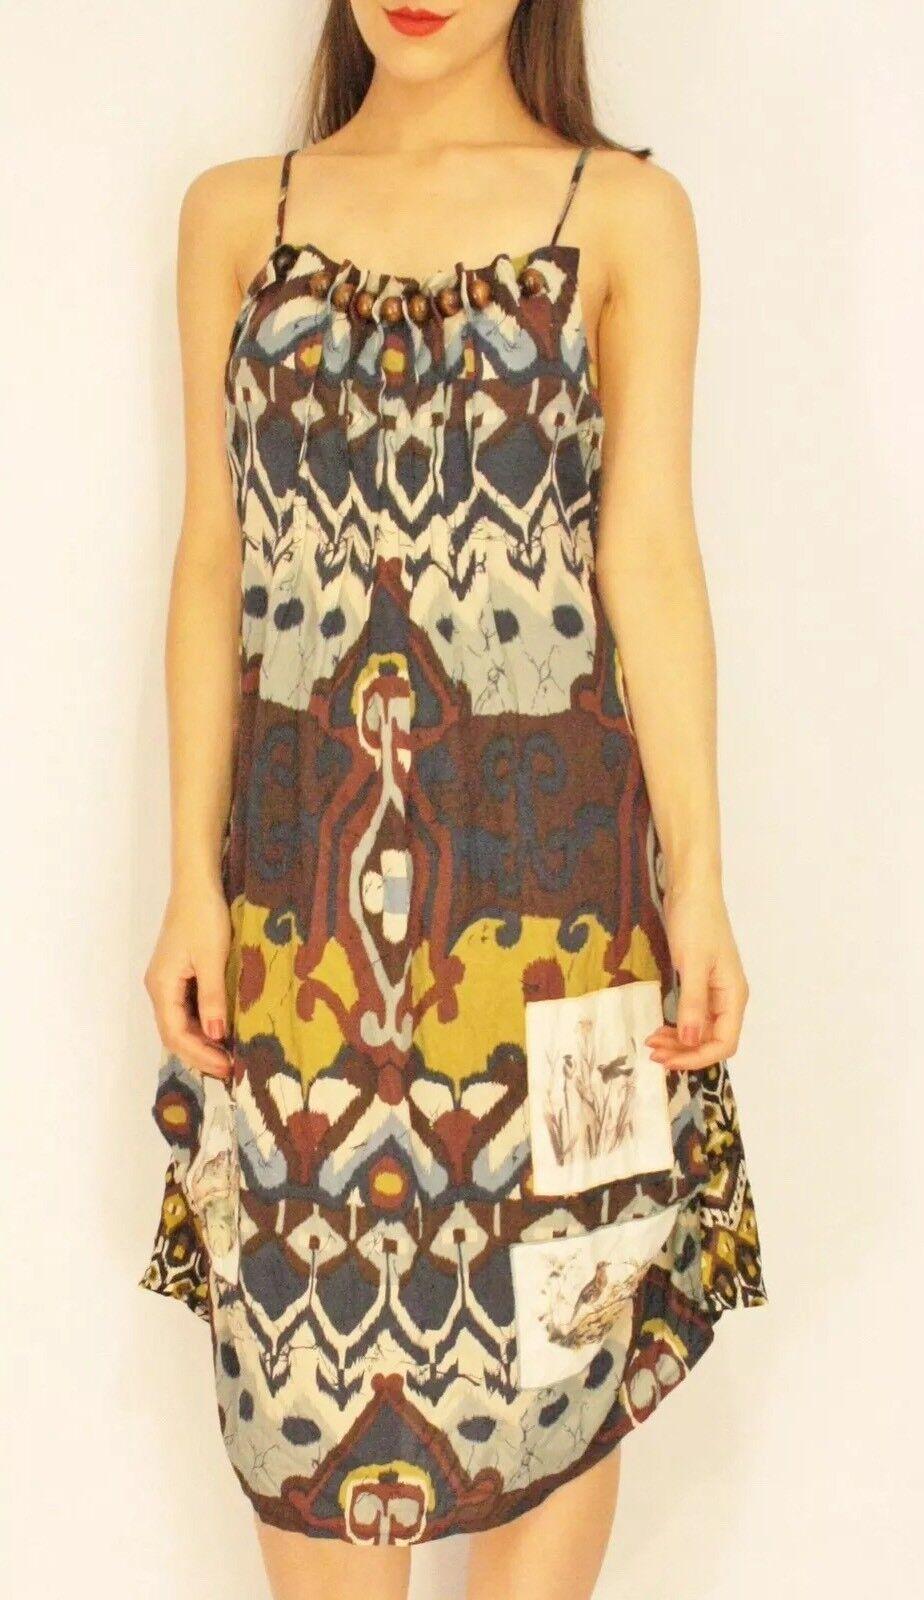 6547764753ca savingglory blue white red Silk Bird Dress France 12 US 8 Eu 40 Au Tribal  ntyxbb7256-Dresses